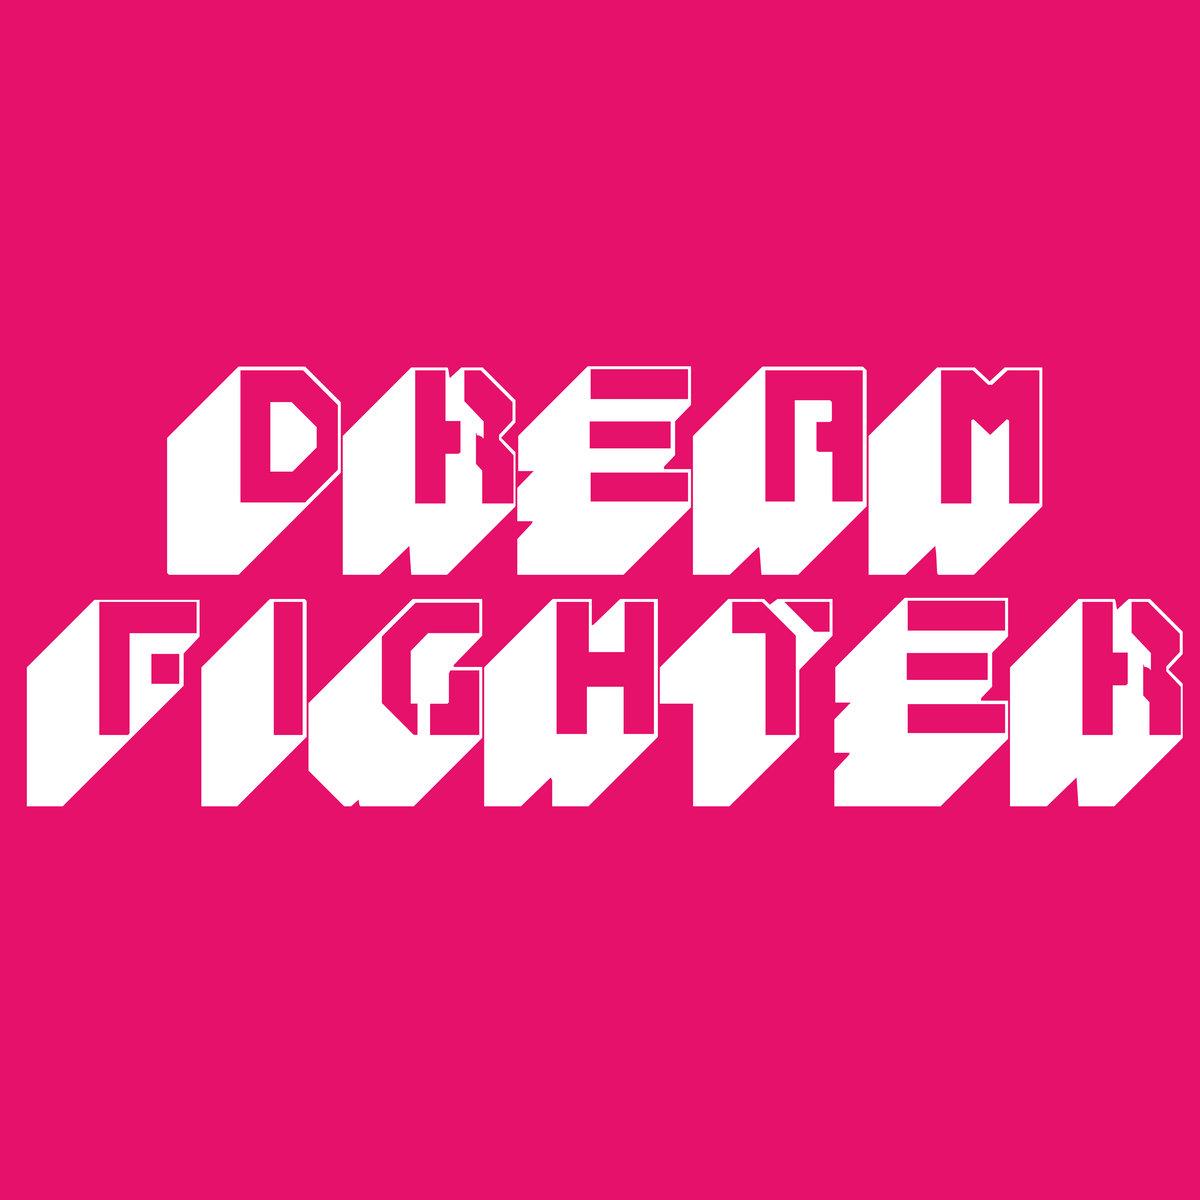 All Around The World (Dream Fighter 80's Dance Mix) | Dream